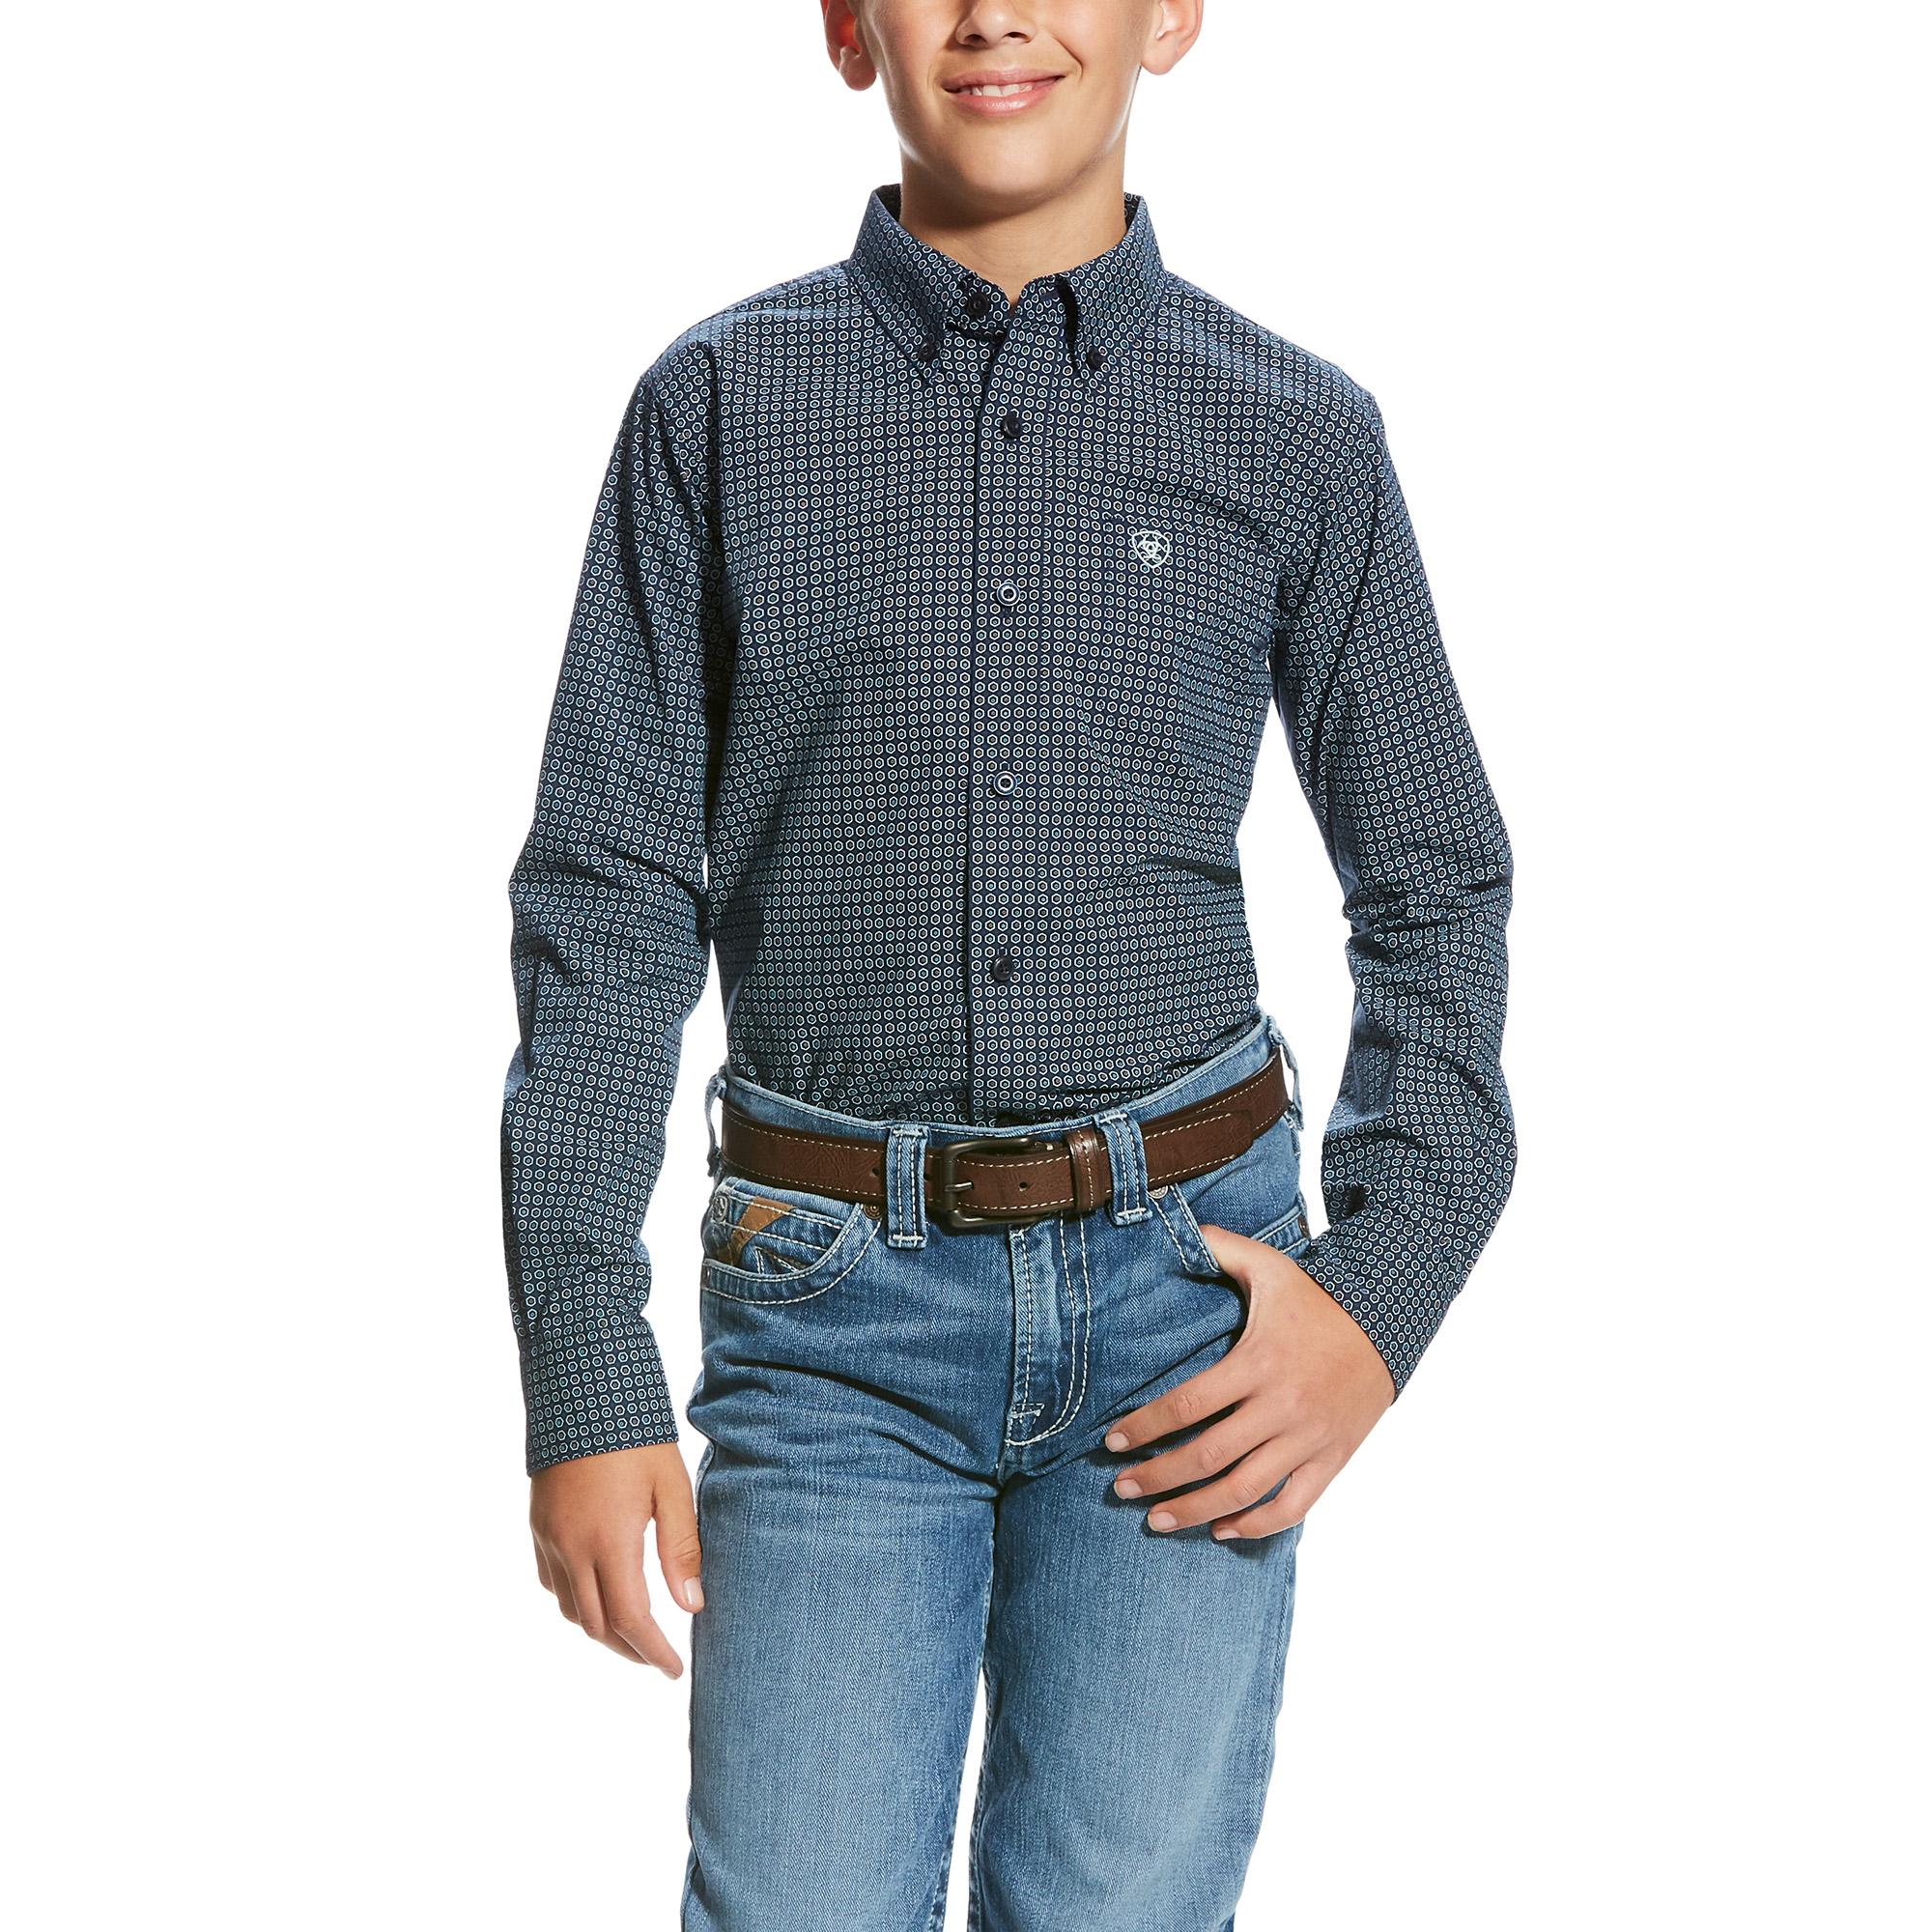 Valdera Shirt from Ariat